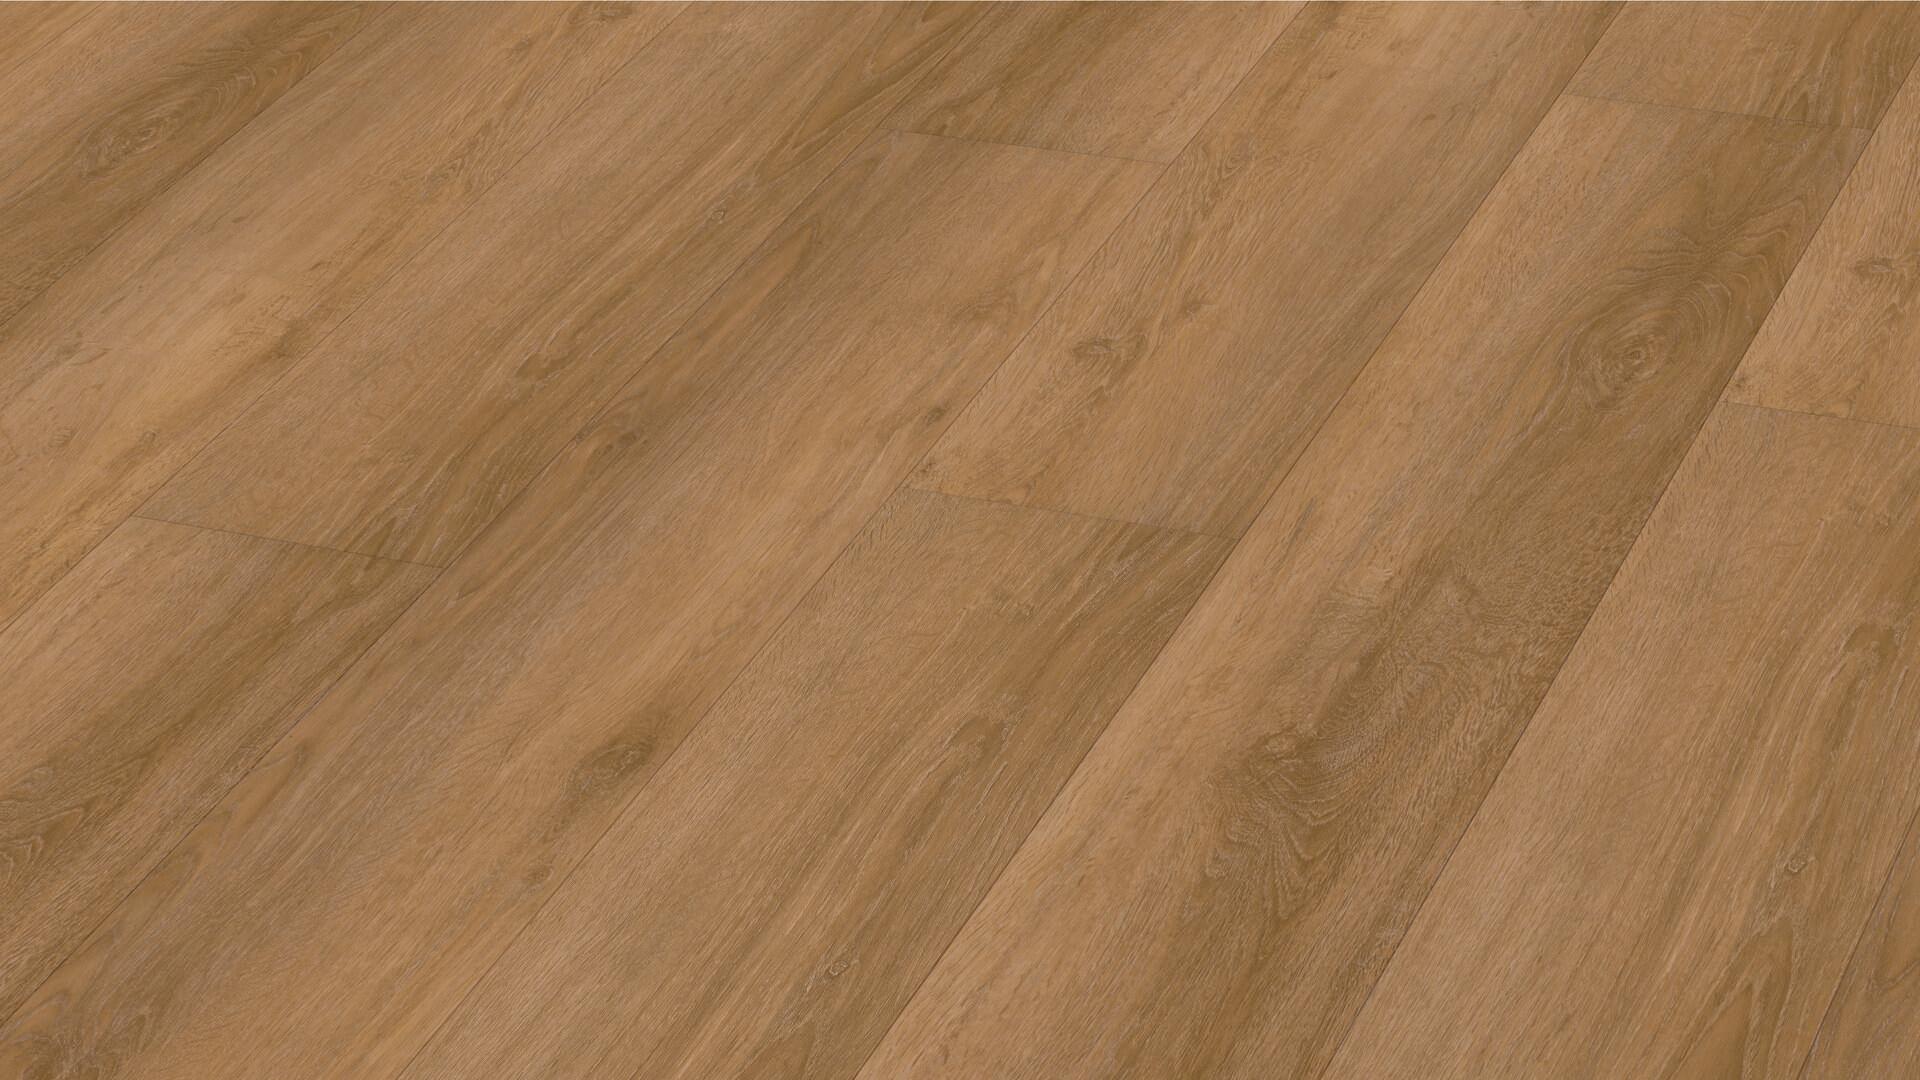 Design flooring MeisterDesign. rigid RD 300 S Country garden oak 7329